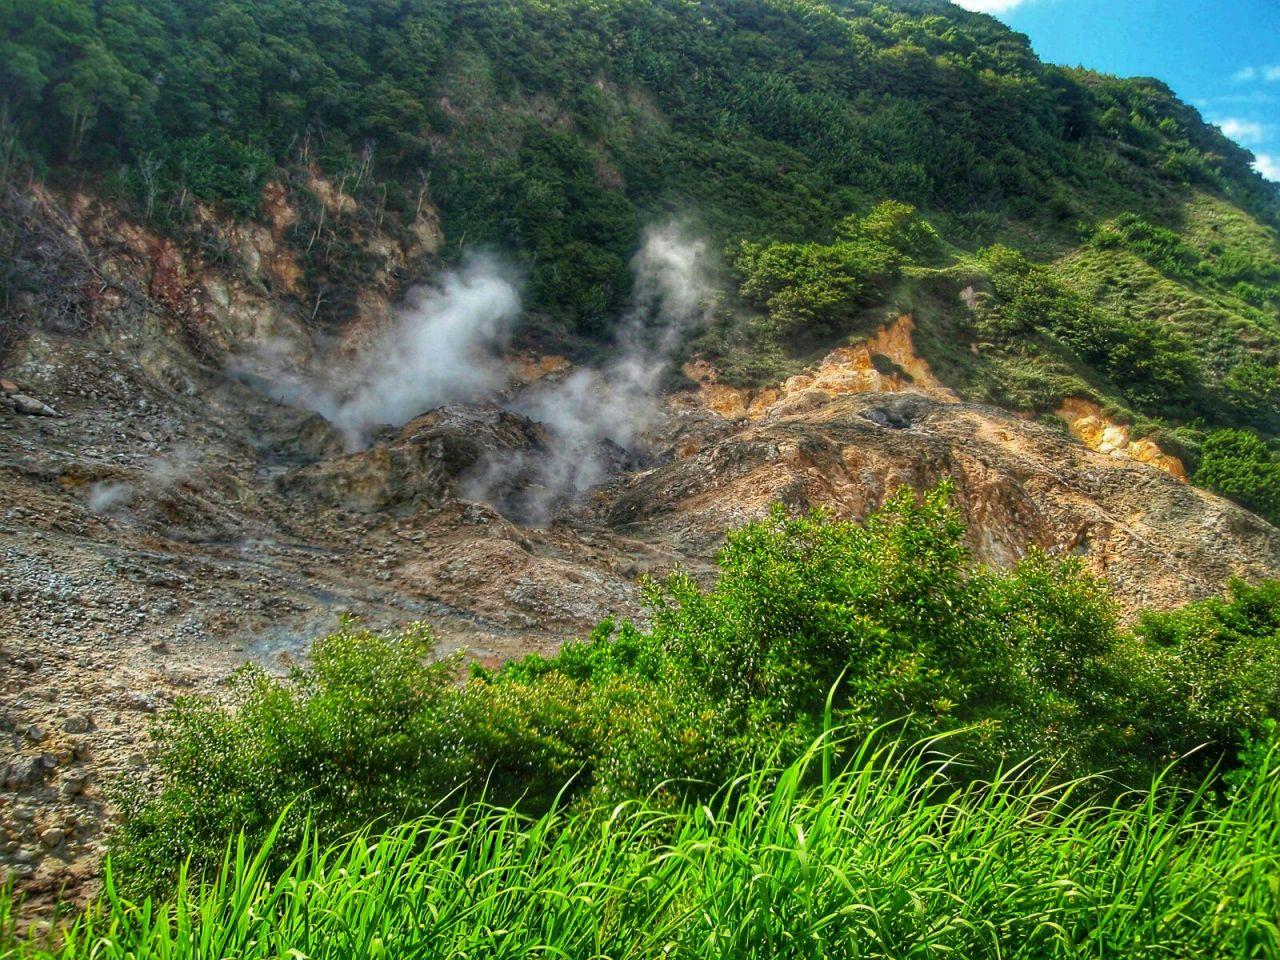 St Lucia's muddy volcanoes